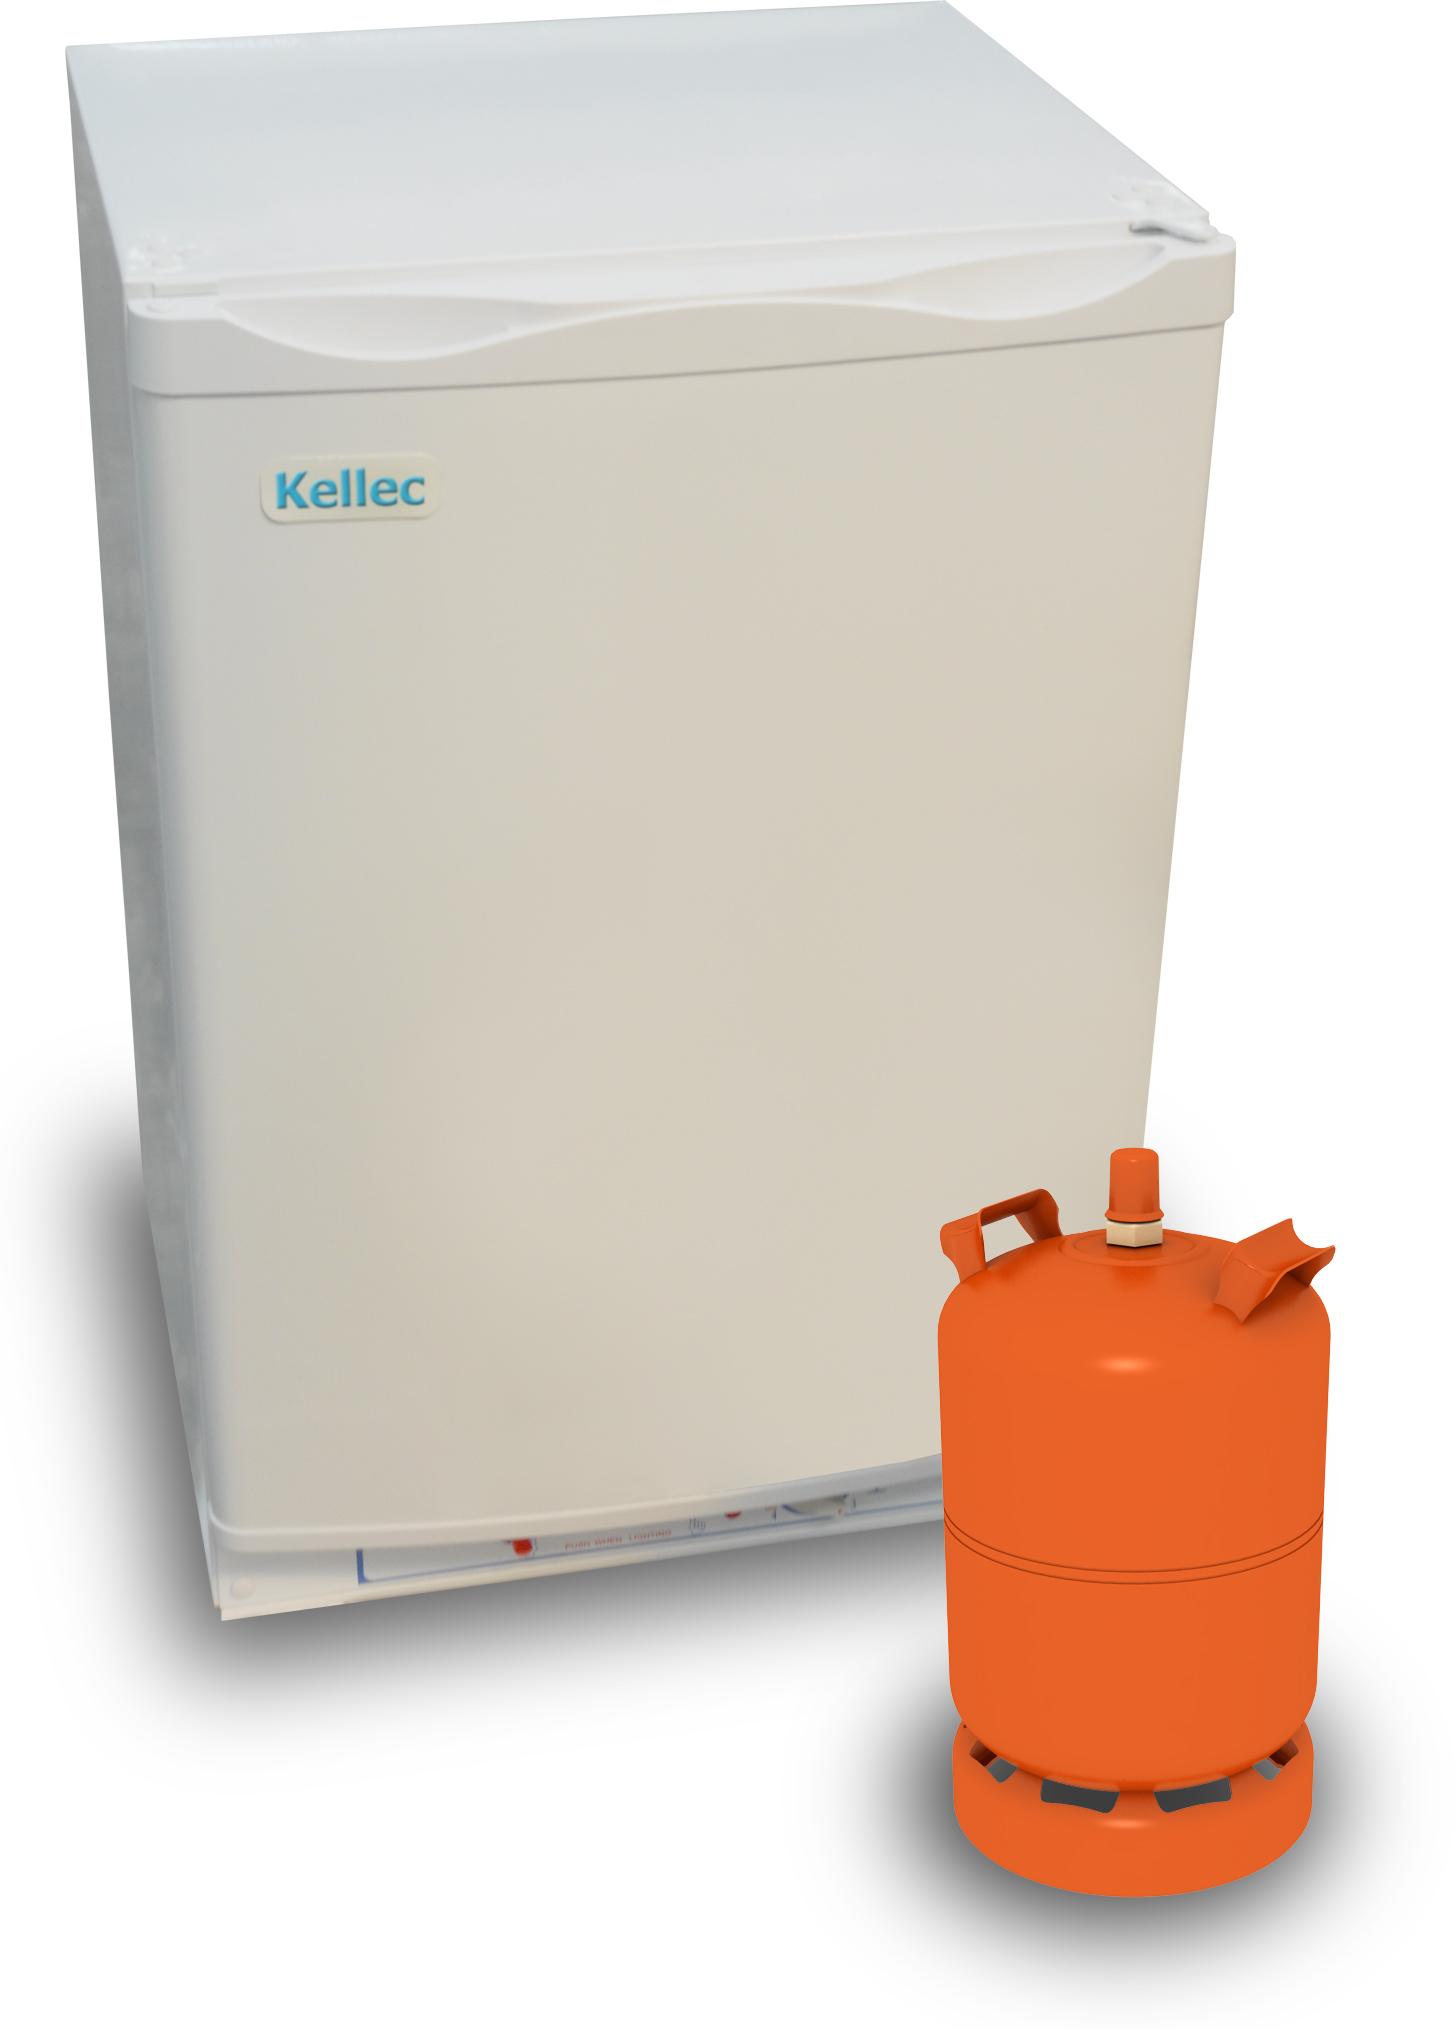 Frigorificos butano frigorifico gas butano nevera gas butano congelador gas butano - Cocina butano segunda mano ...